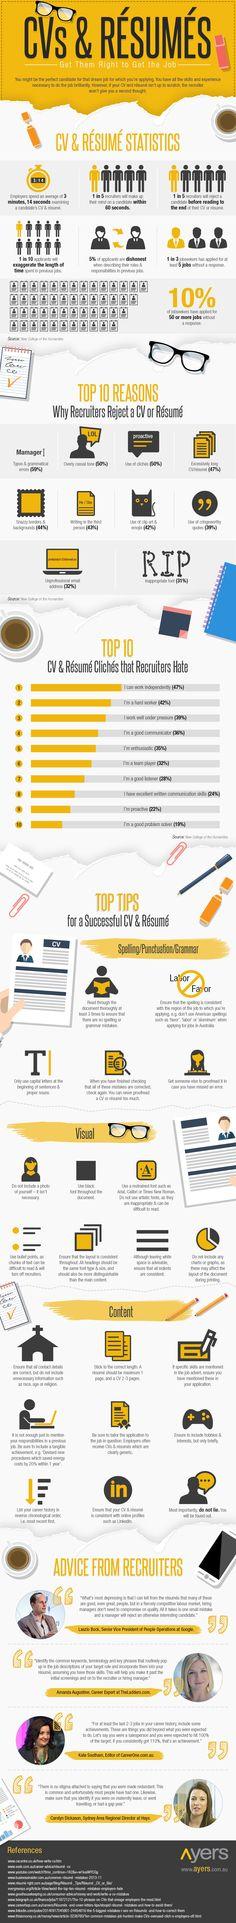 15 best Resume images on Pinterest Resume cv, Career and Resume tips